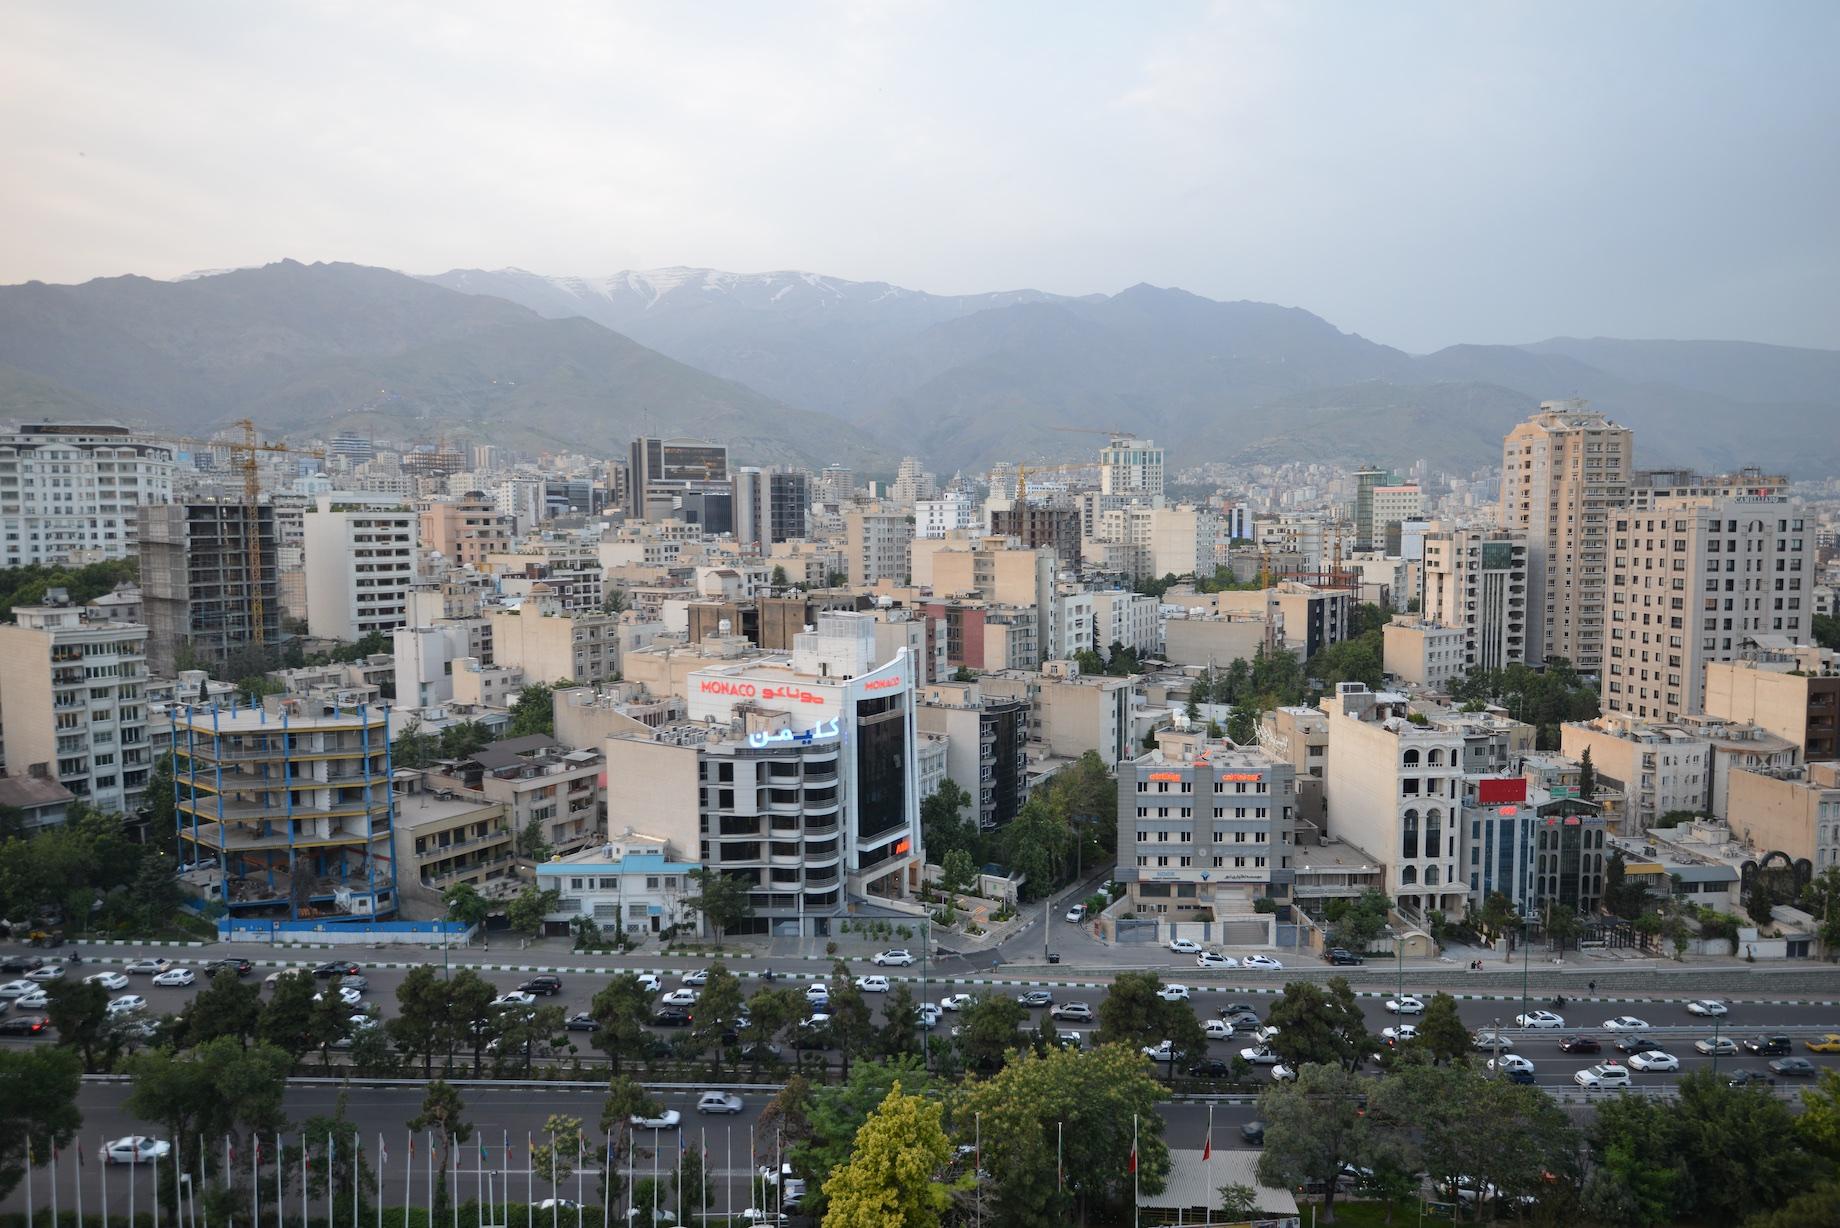 Teheran, Iran, CC BY-NC-SA 4.0 Martin Albrecht